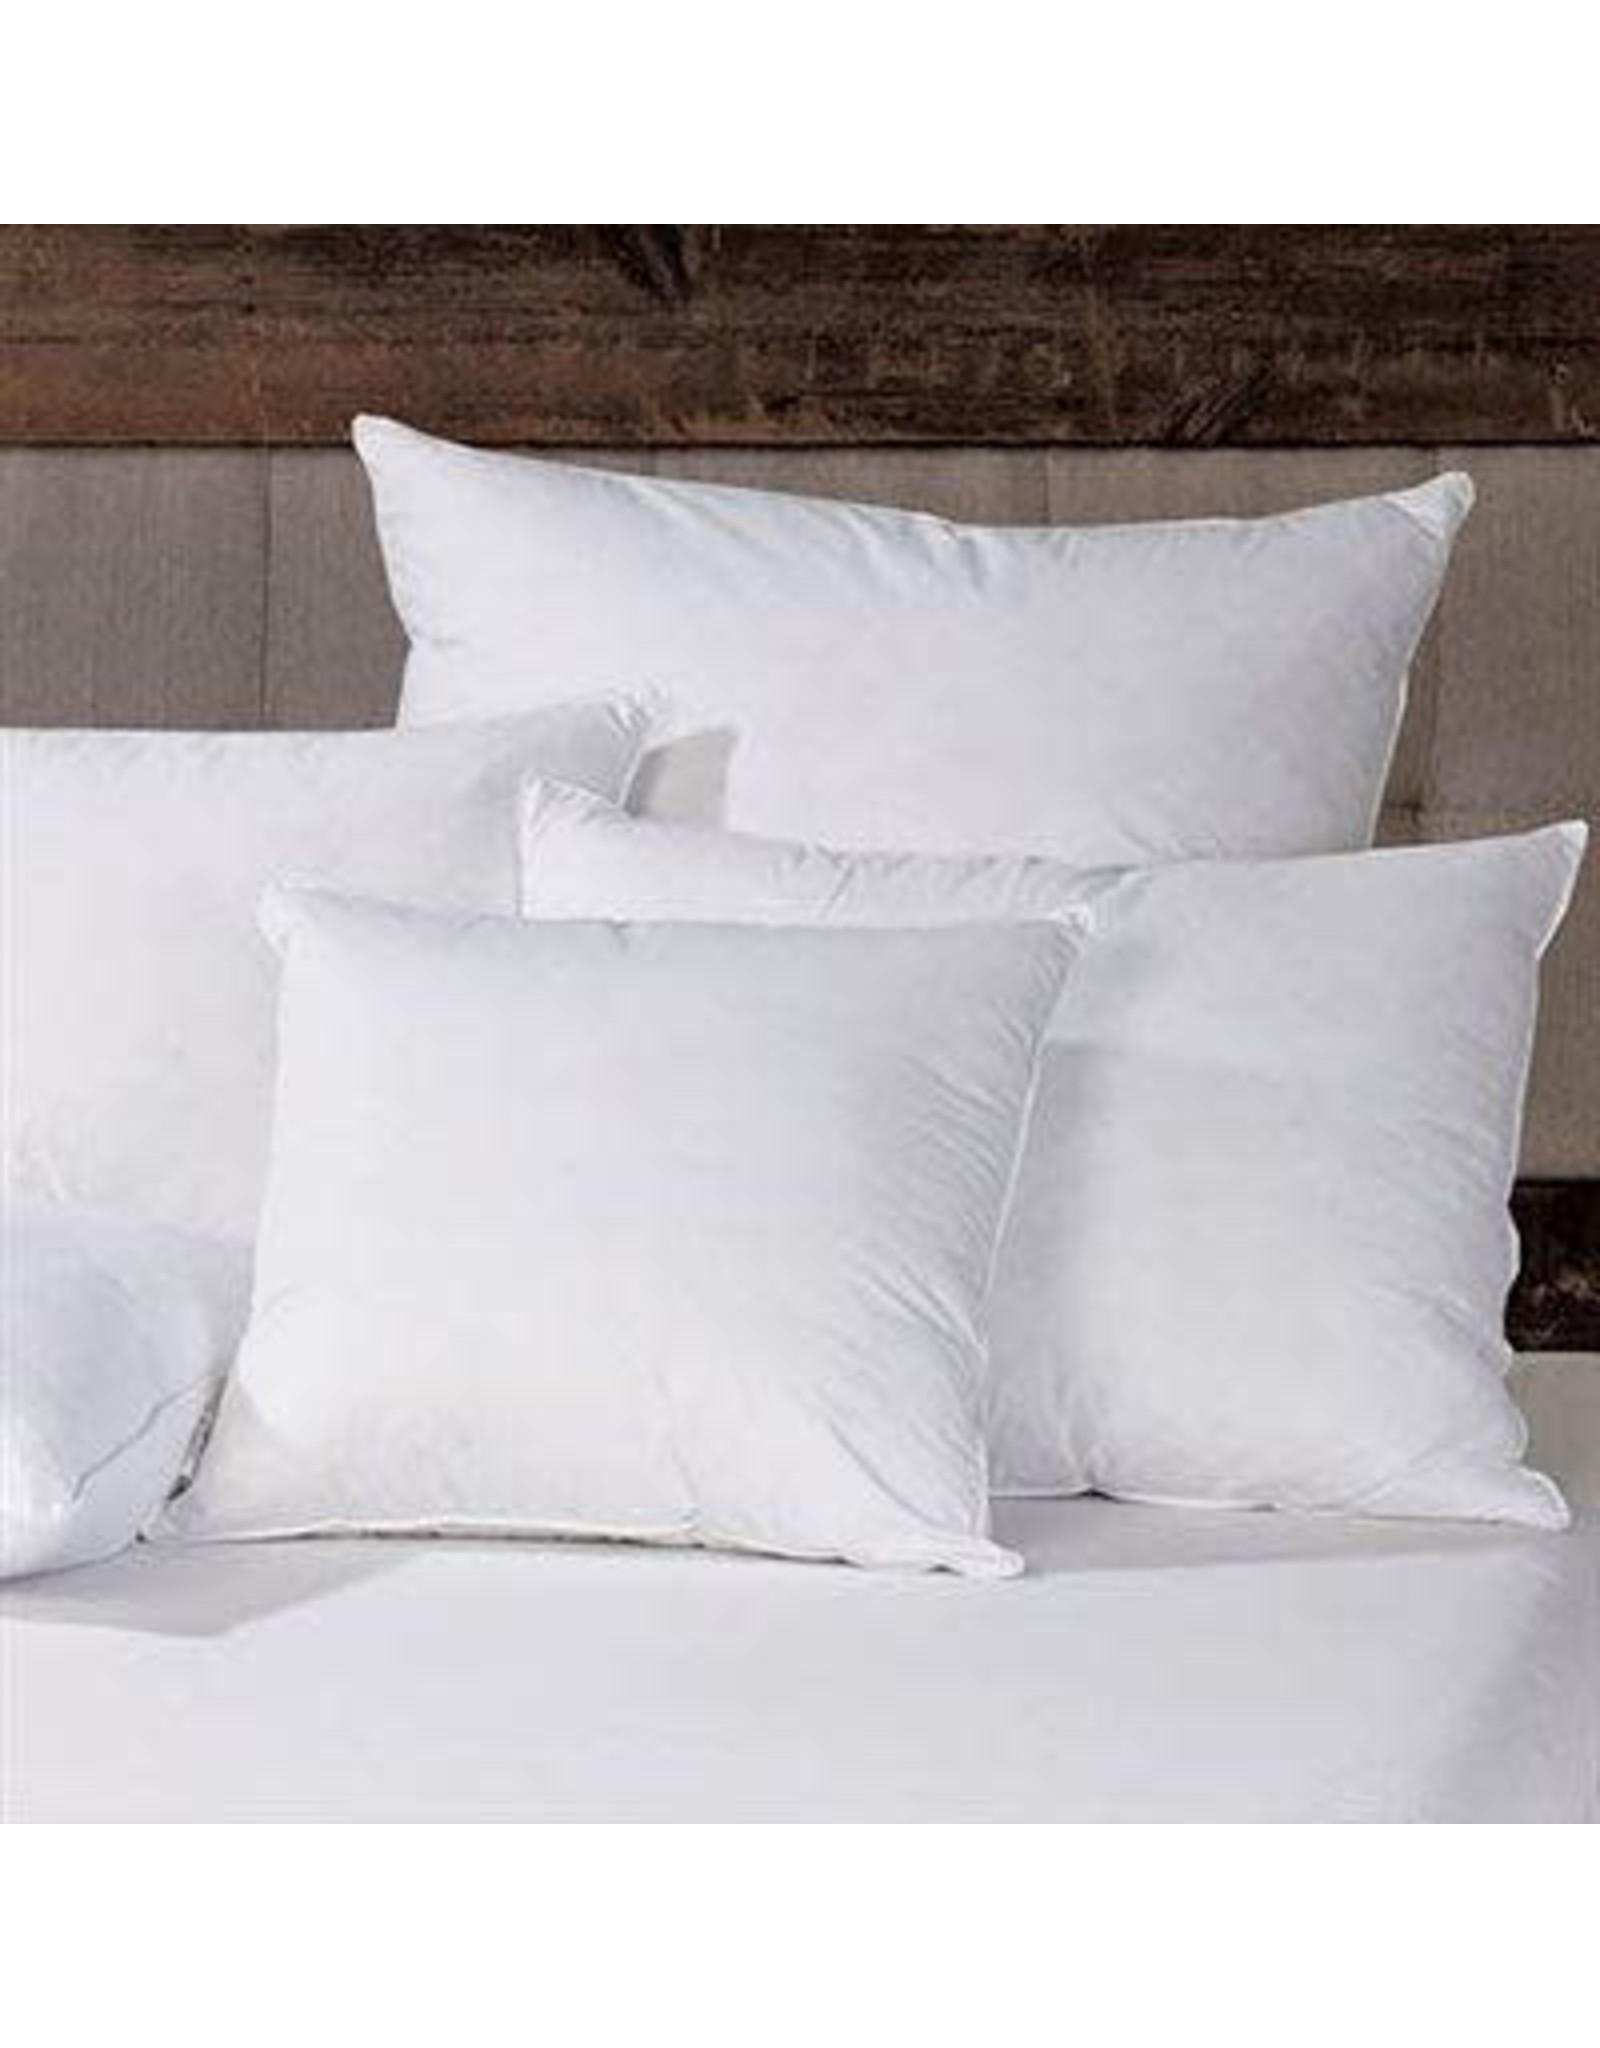 "HiEnd Accents 29""x 29"" Soft Down Euro Pillow Insert"